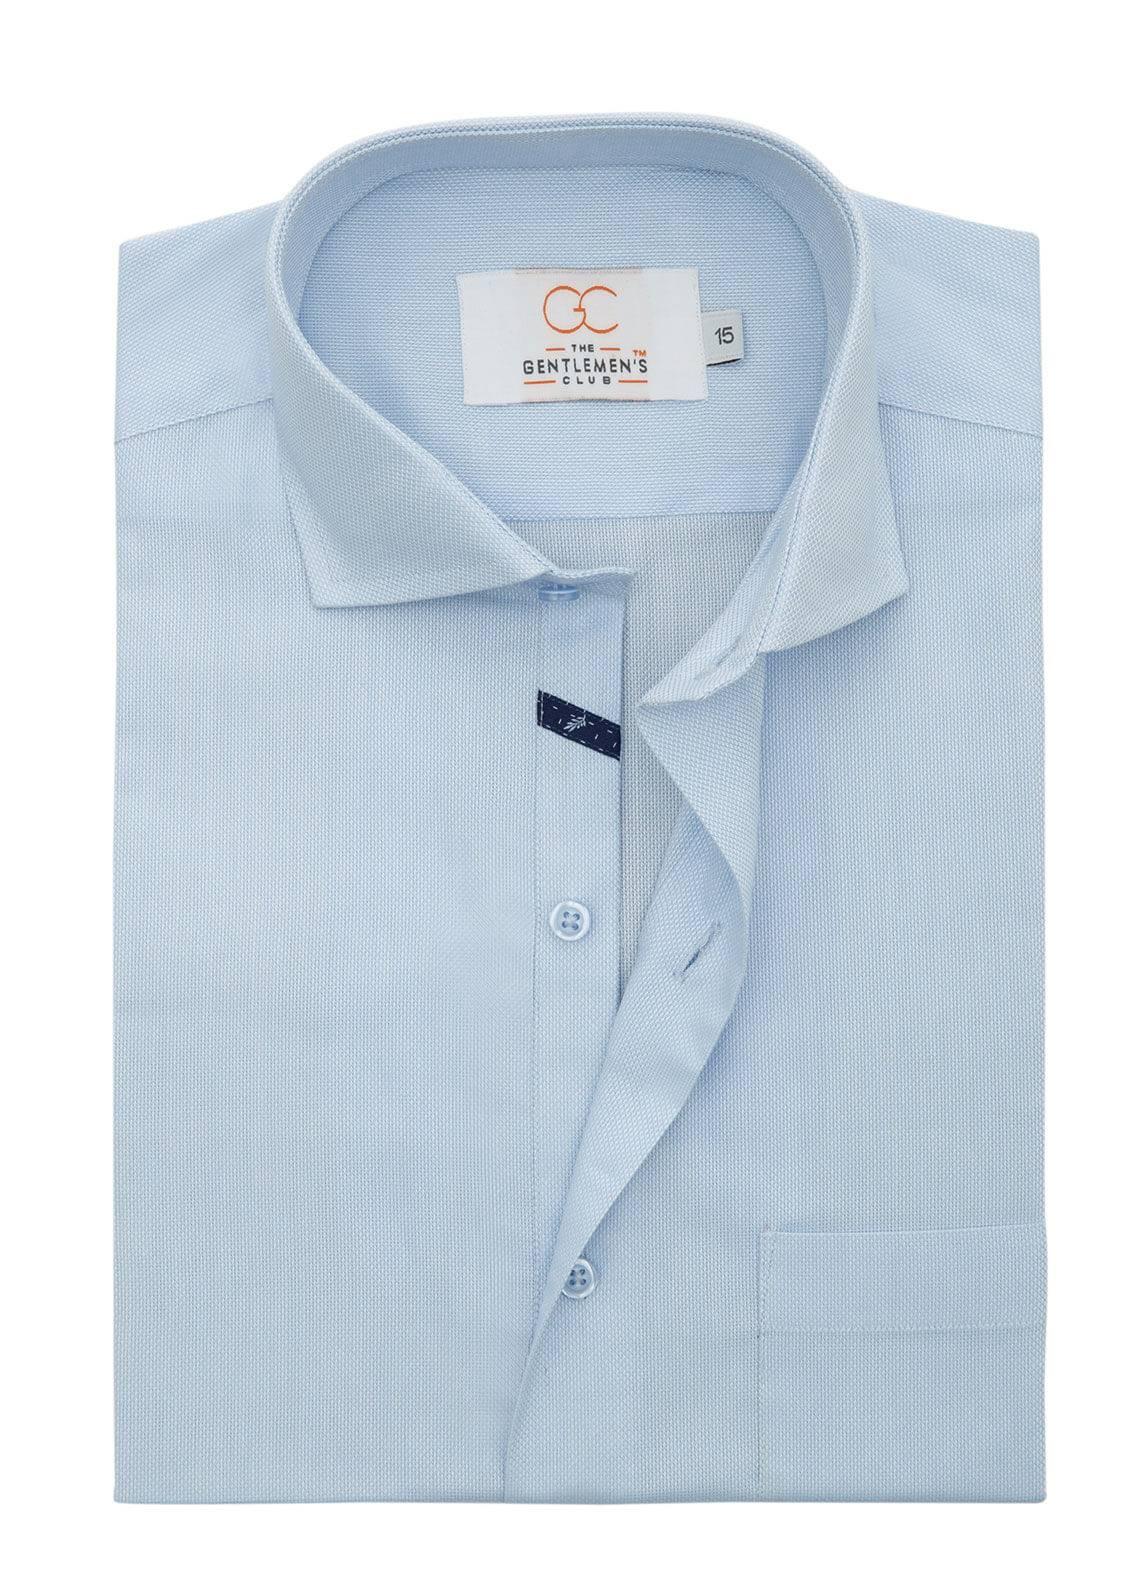 The Gentlemen's Club Cotton Formal Men Shirts - Sky Blue White Label 4081 - 18